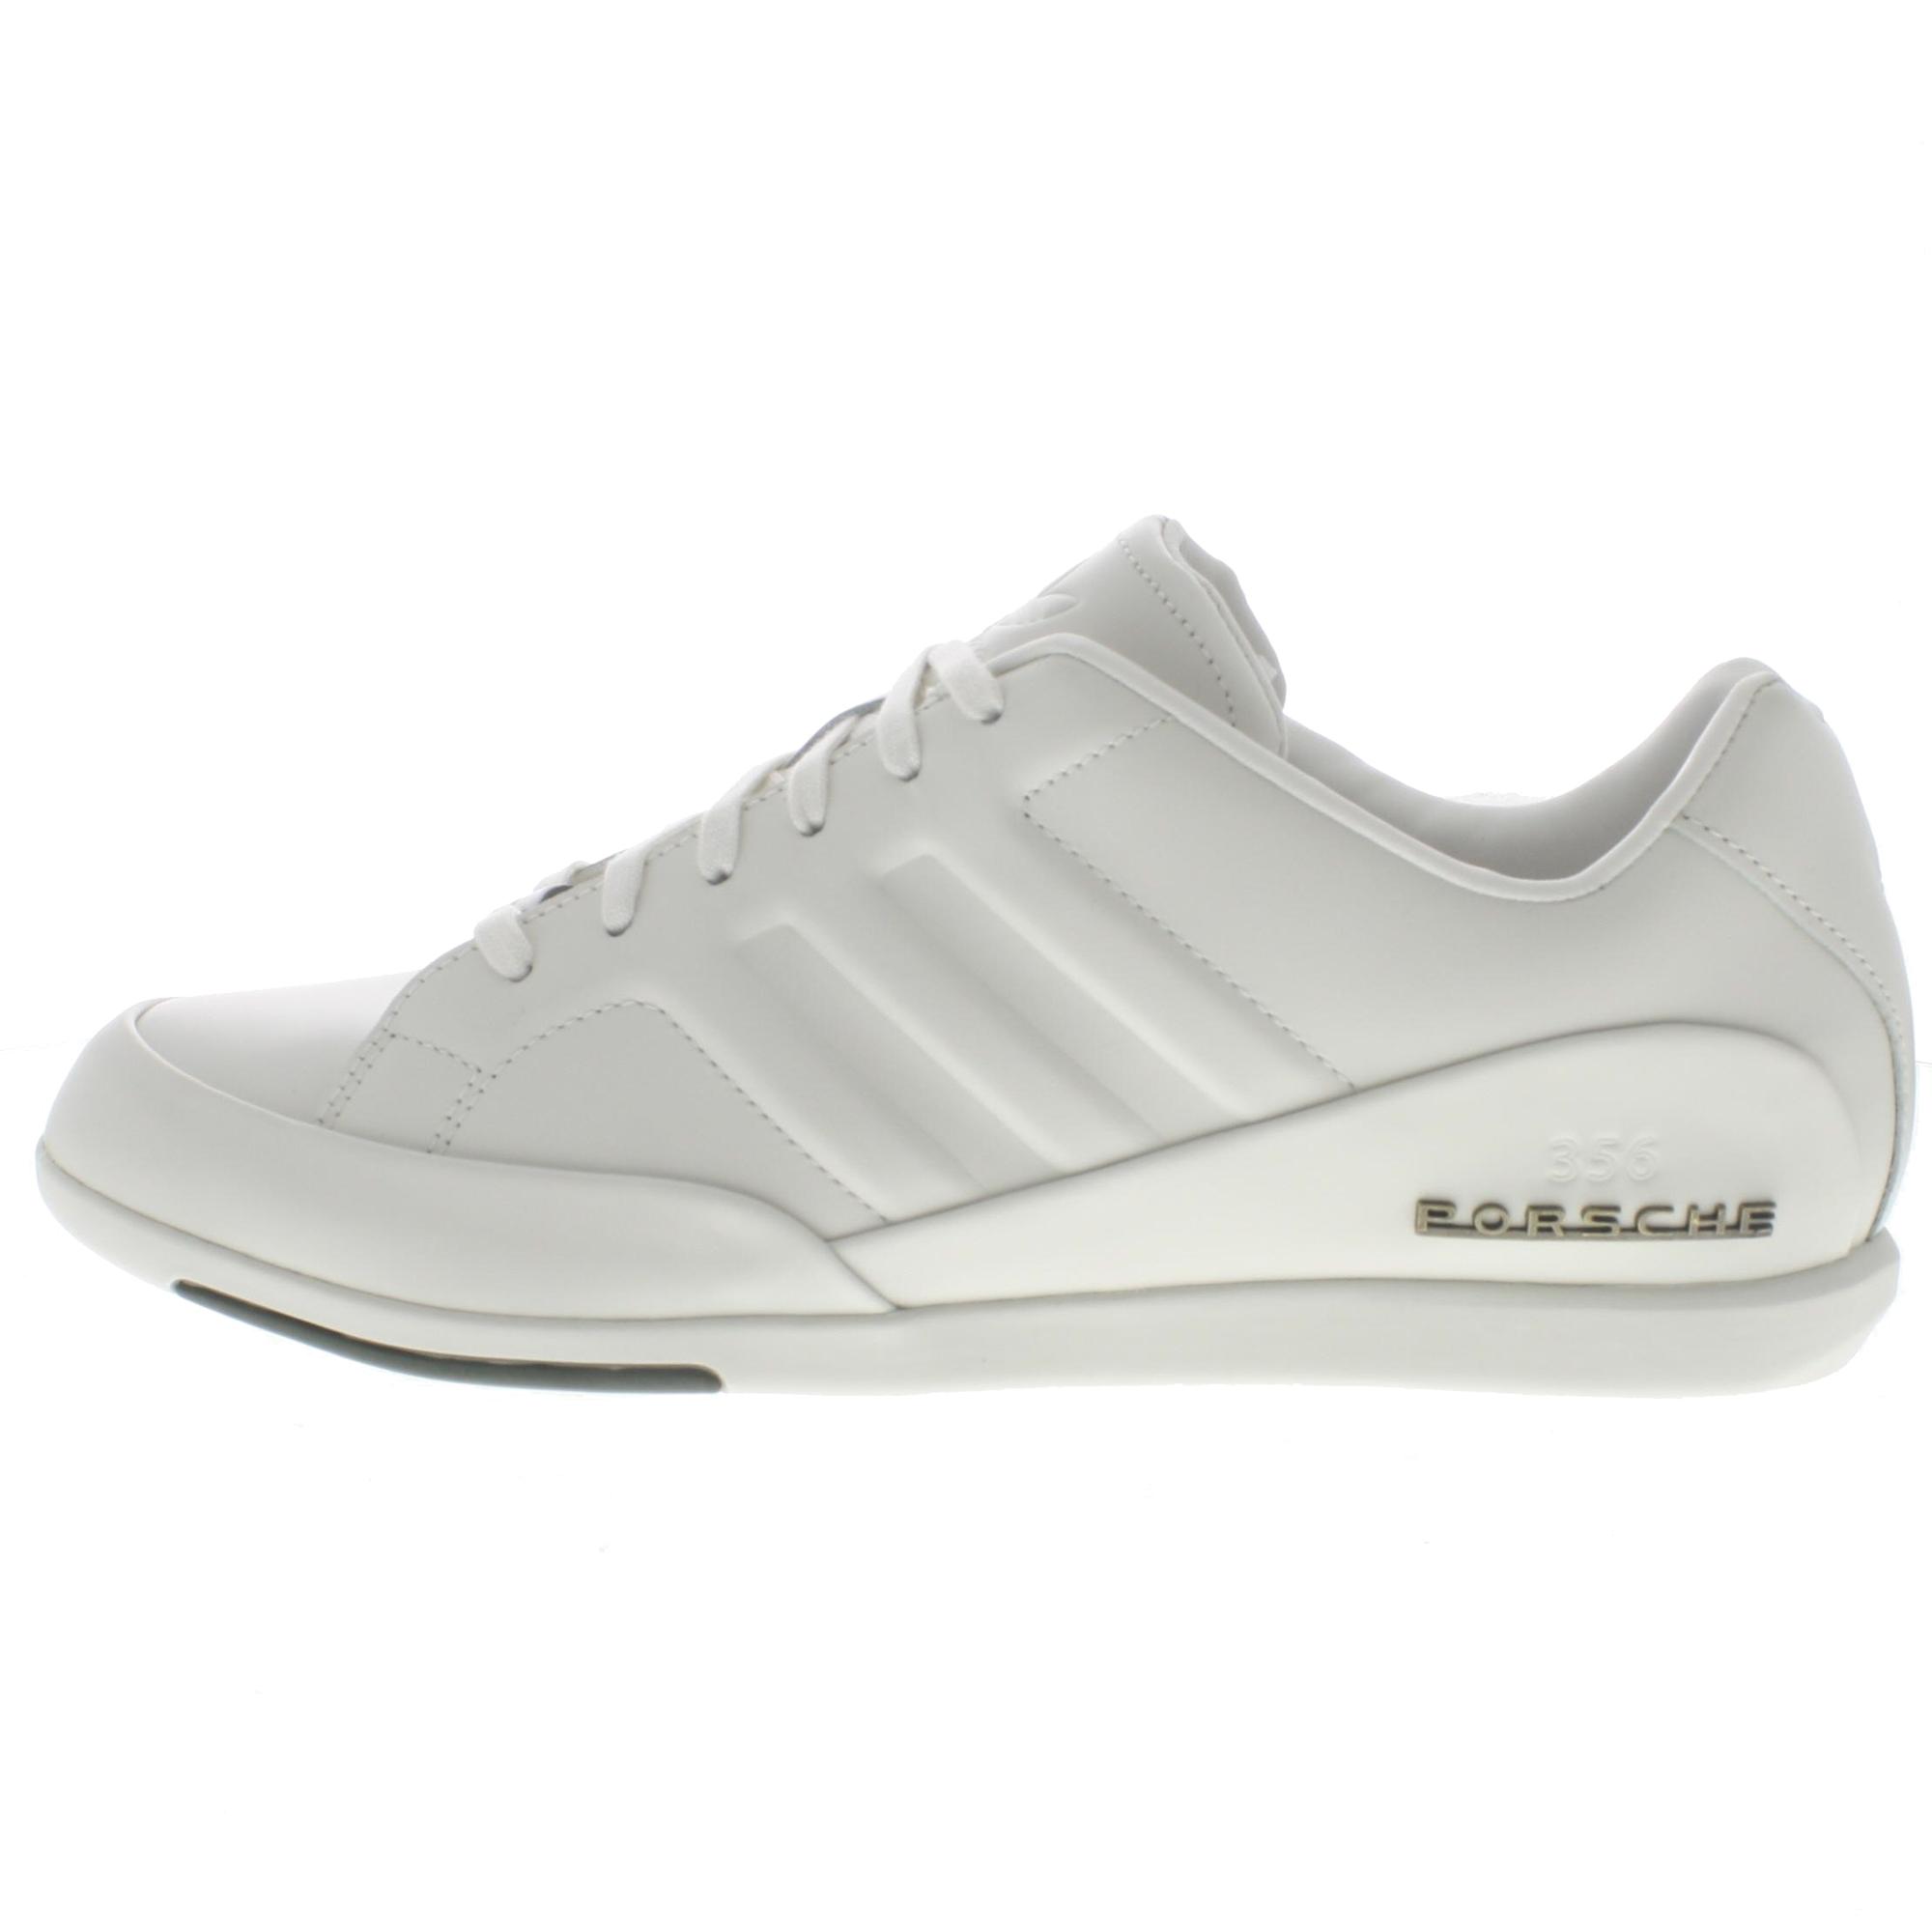 433607e1652c1 netherlands adidas porsche design fiyat incele 6255f 55ff1